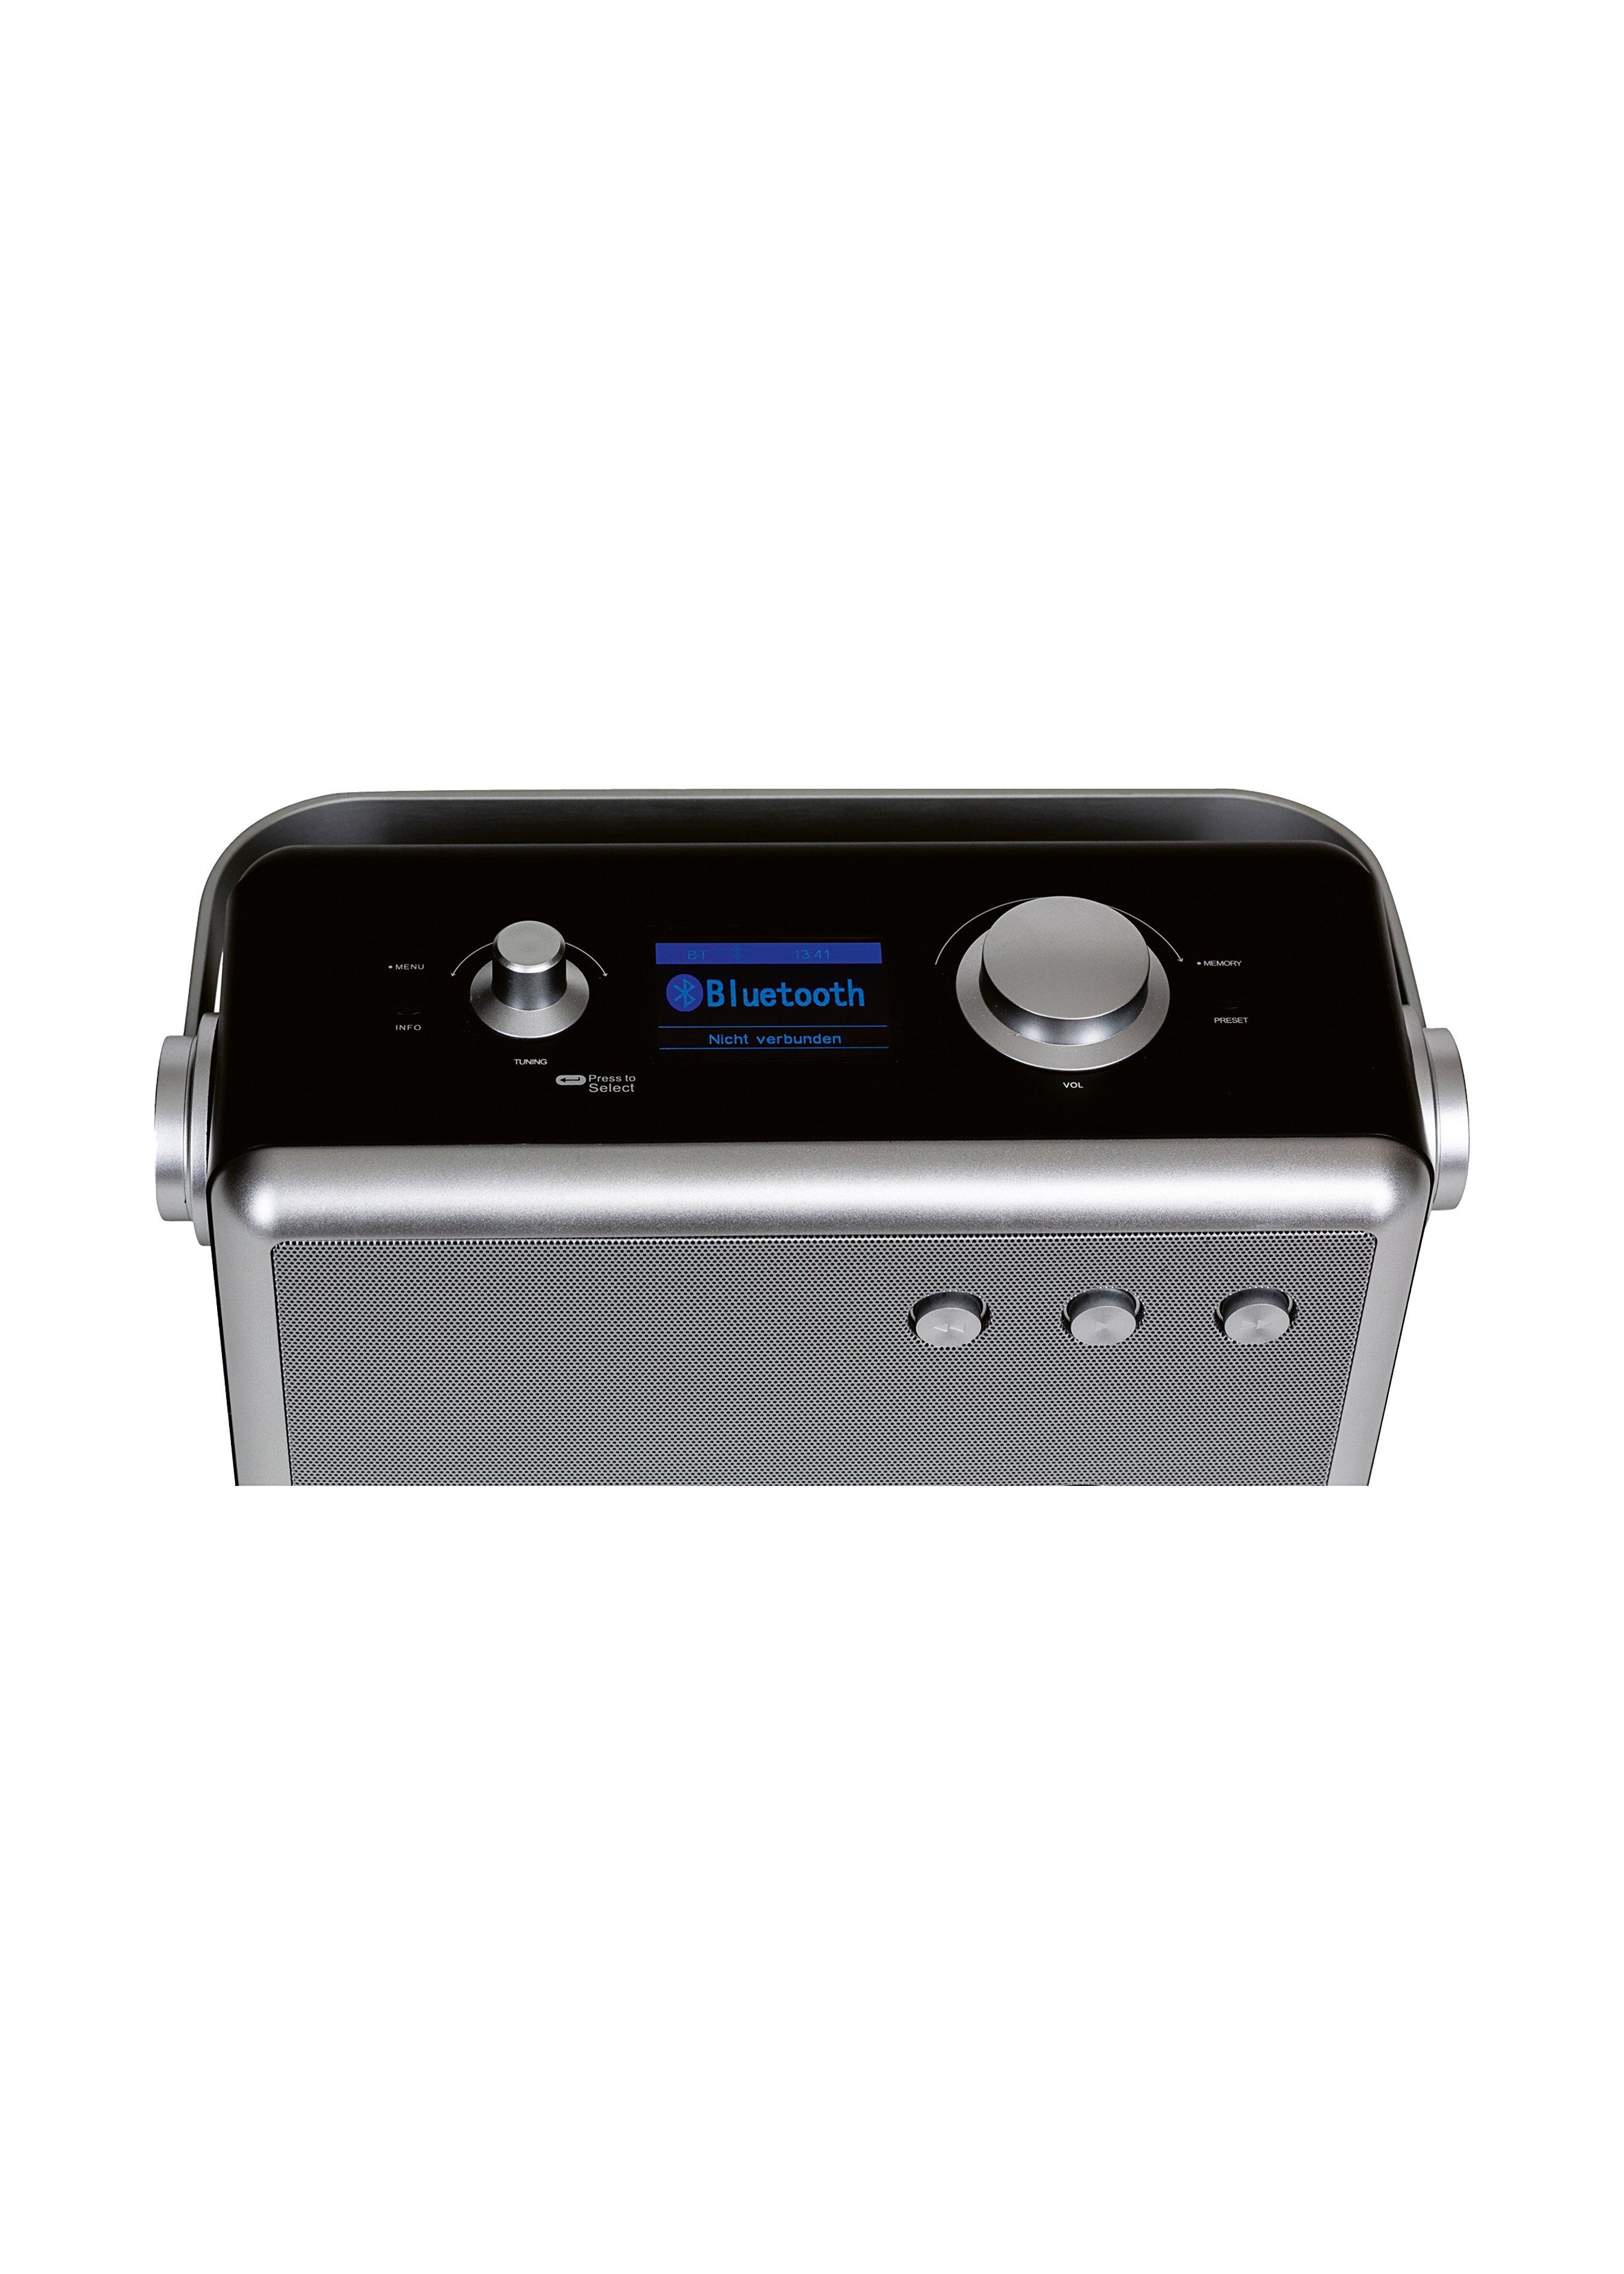 Digitalradio mit DAB+, UKW und Bluetooth 254401 2